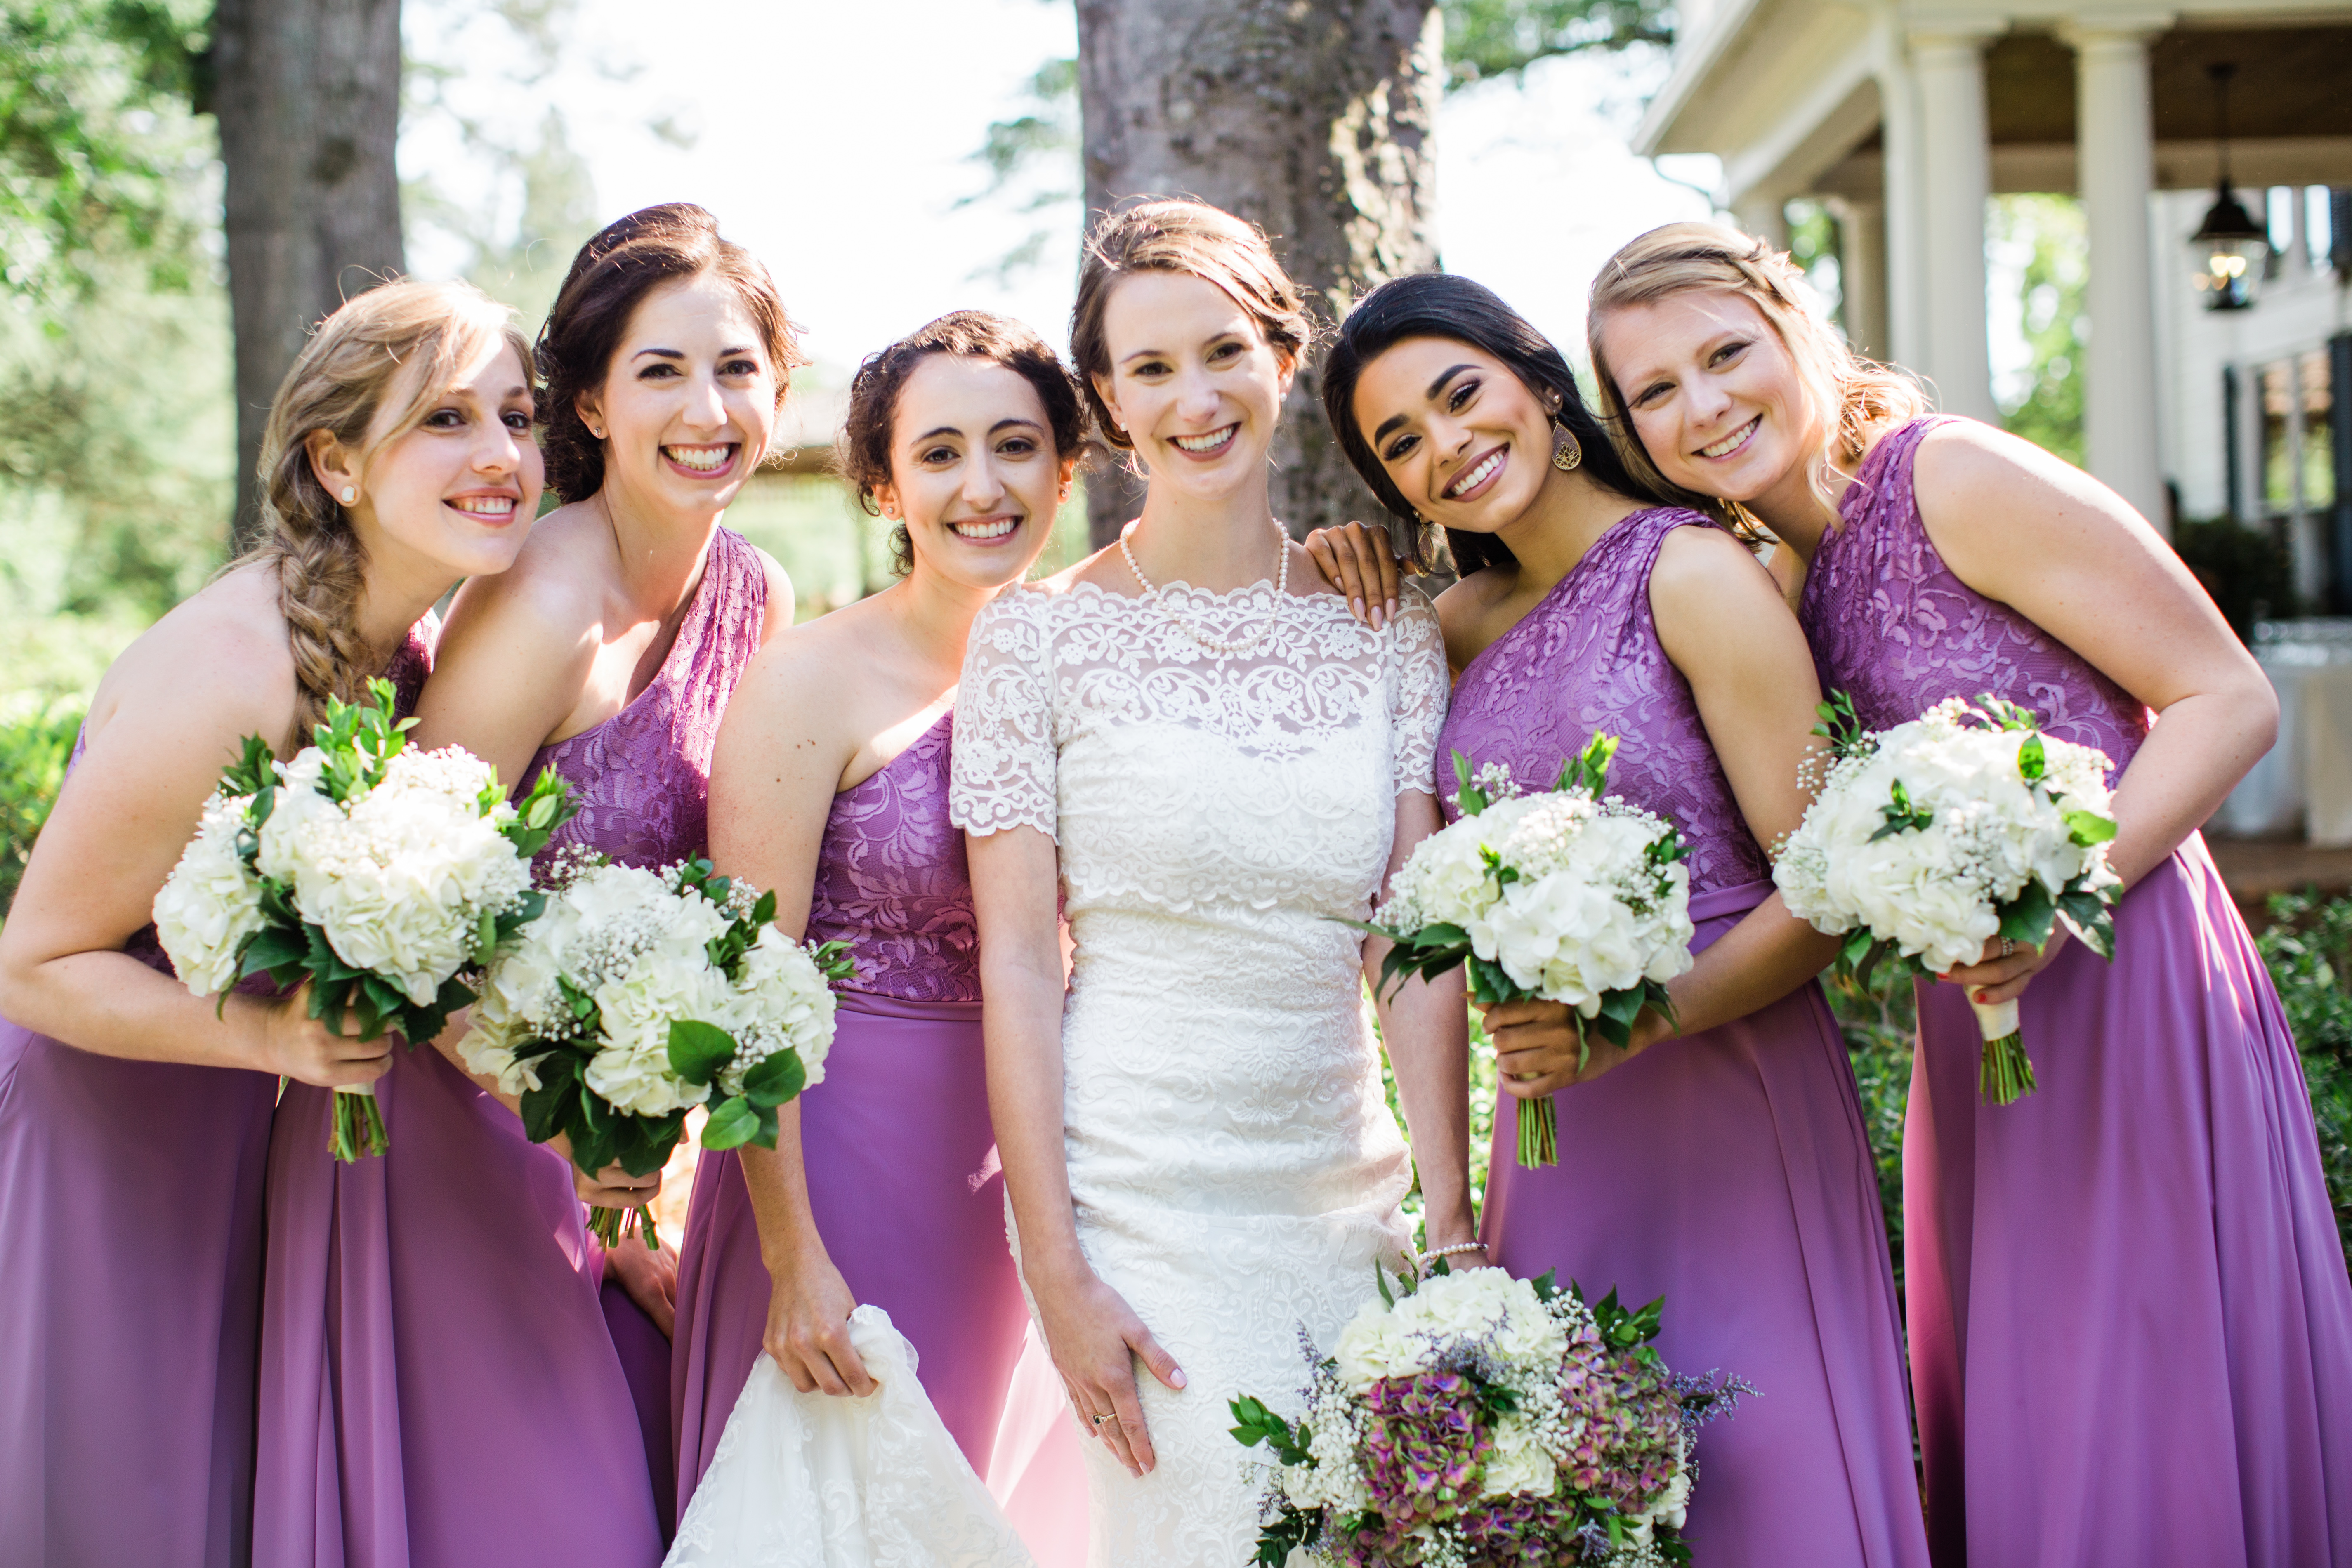 Asterisk Photo_Glaccum Wedding Preview-8